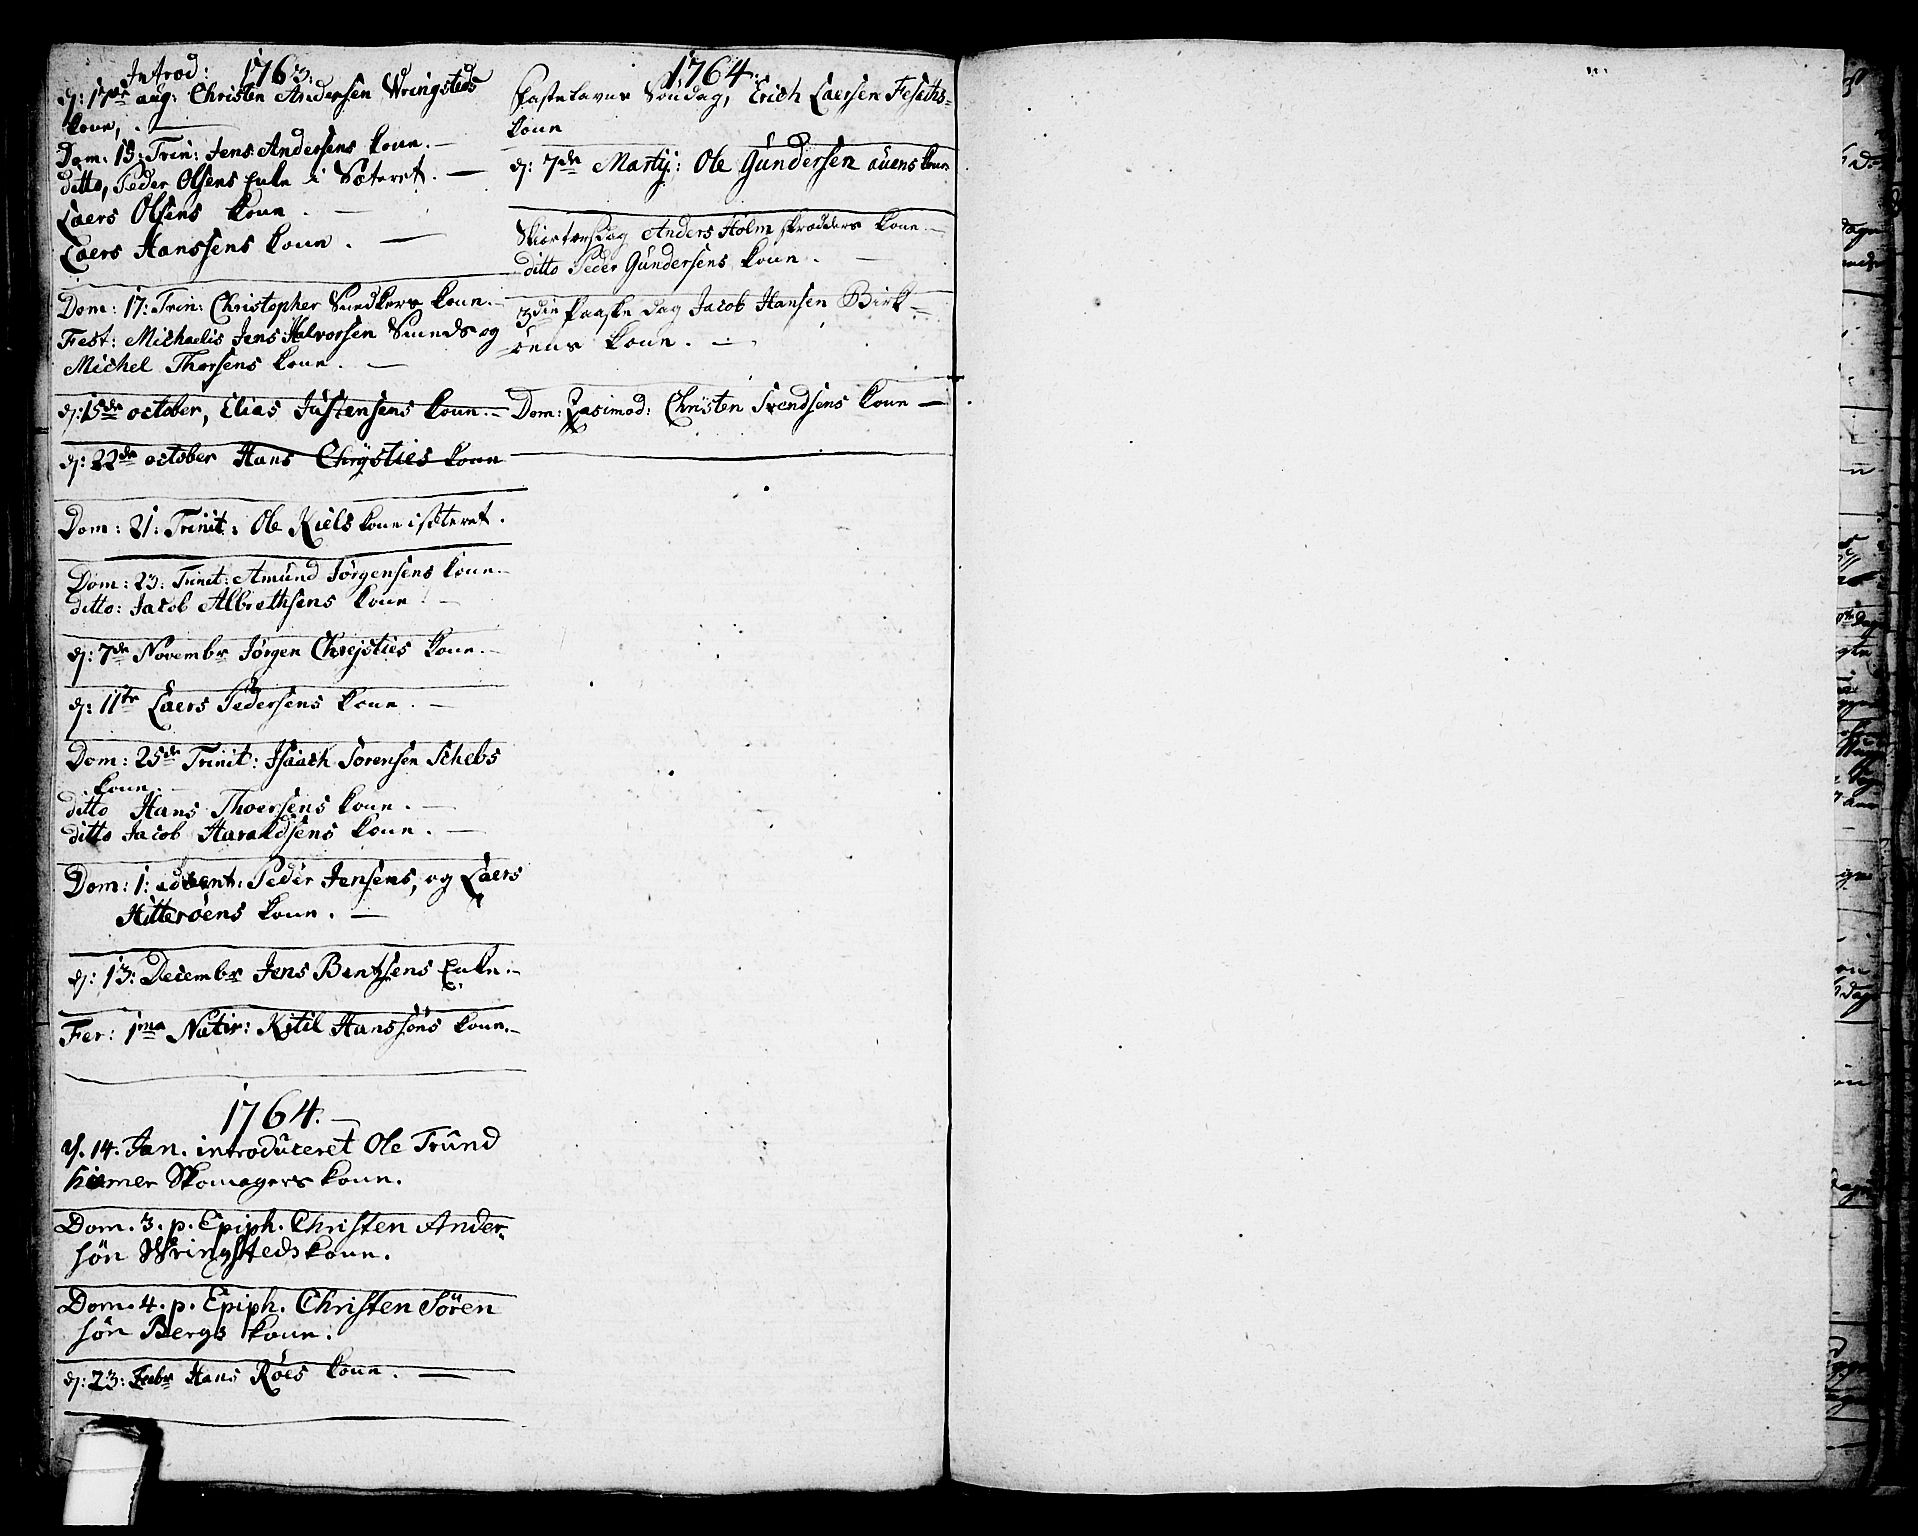 SAKO, Brevik kirkebøker, F/Fa/L0002: Ministerialbok nr. 2, 1720-1764, s. 47e